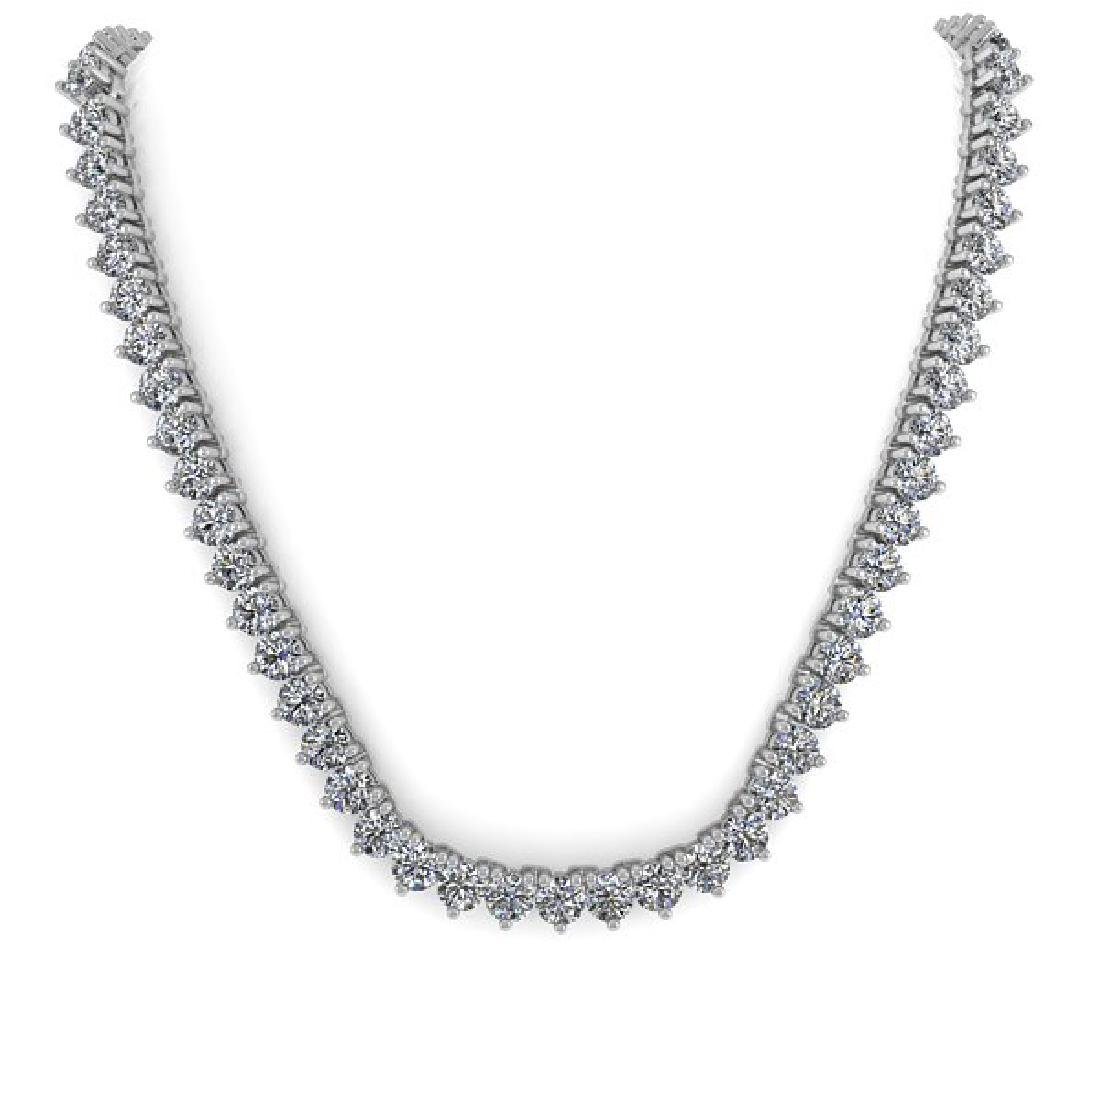 48 CTW Solitaire SI Diamond Necklace 14K White Gold - 3